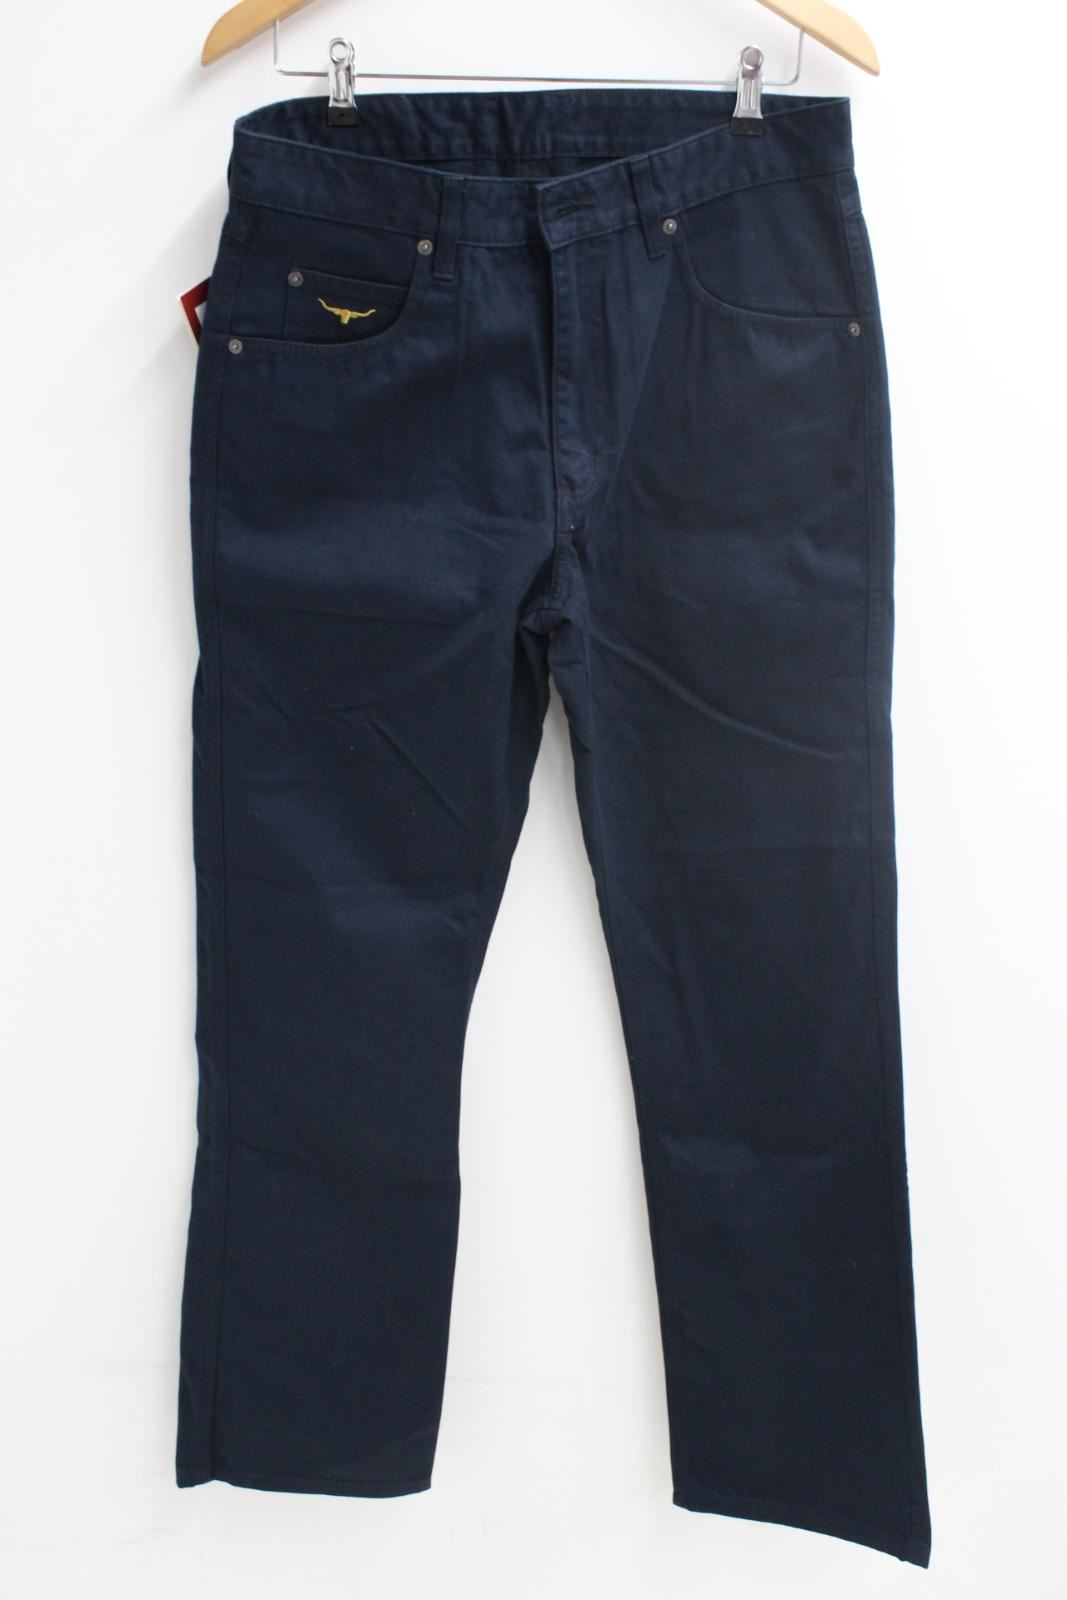 BNWT R.M WILLIAMS Mens Linesman Low Rise Regular Fit Jeans Straight Leg 32R